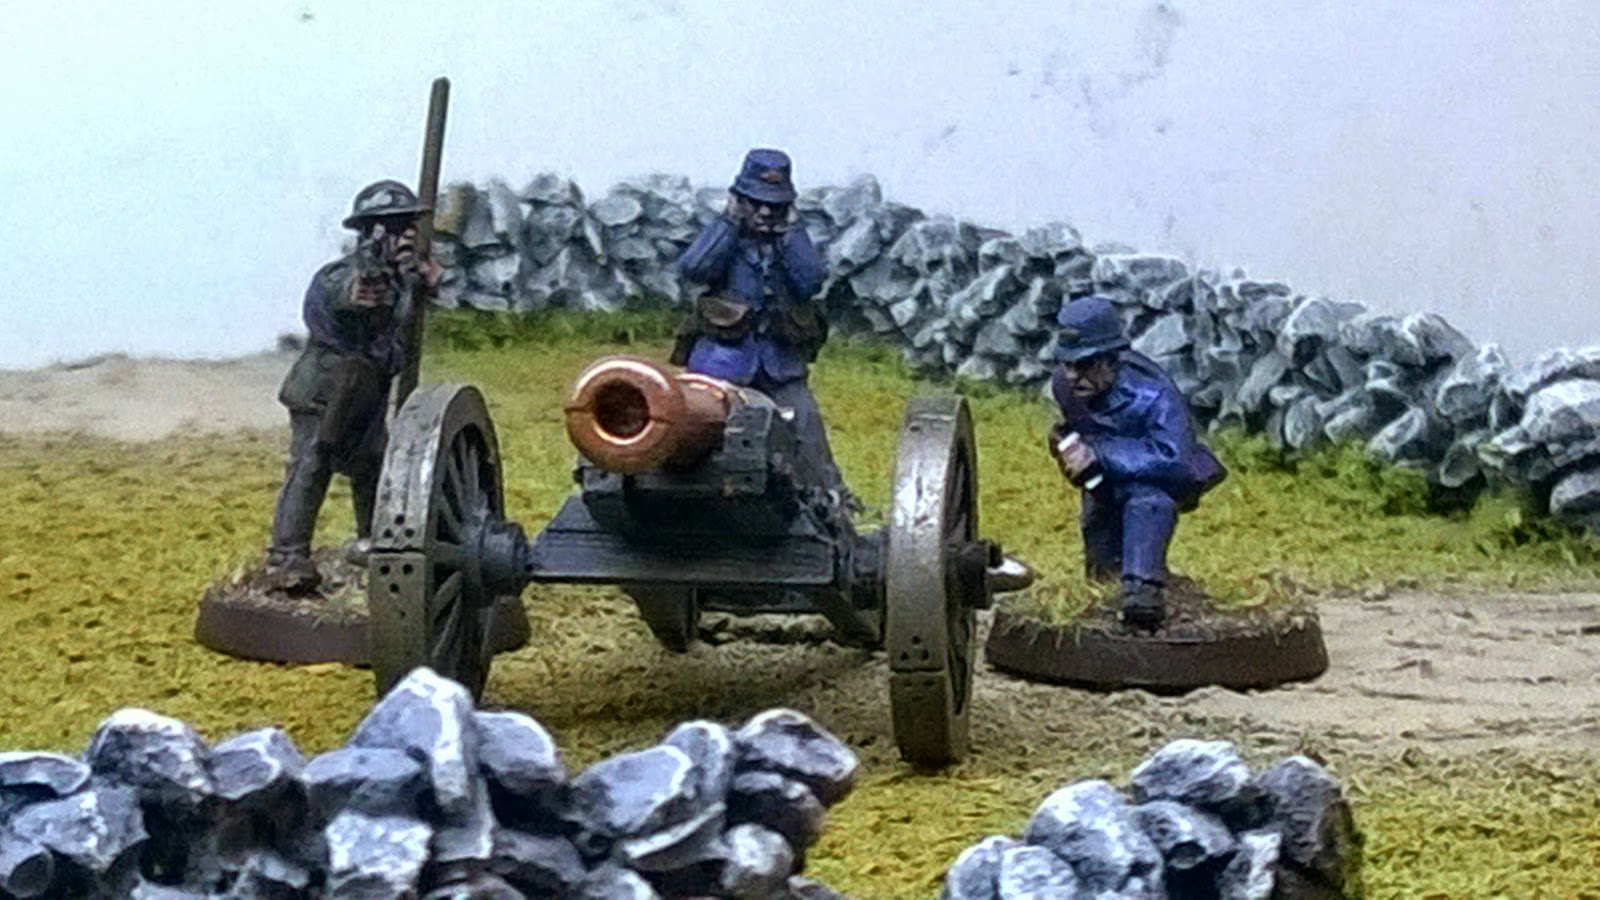 vbcw cannon artillery very british civil war